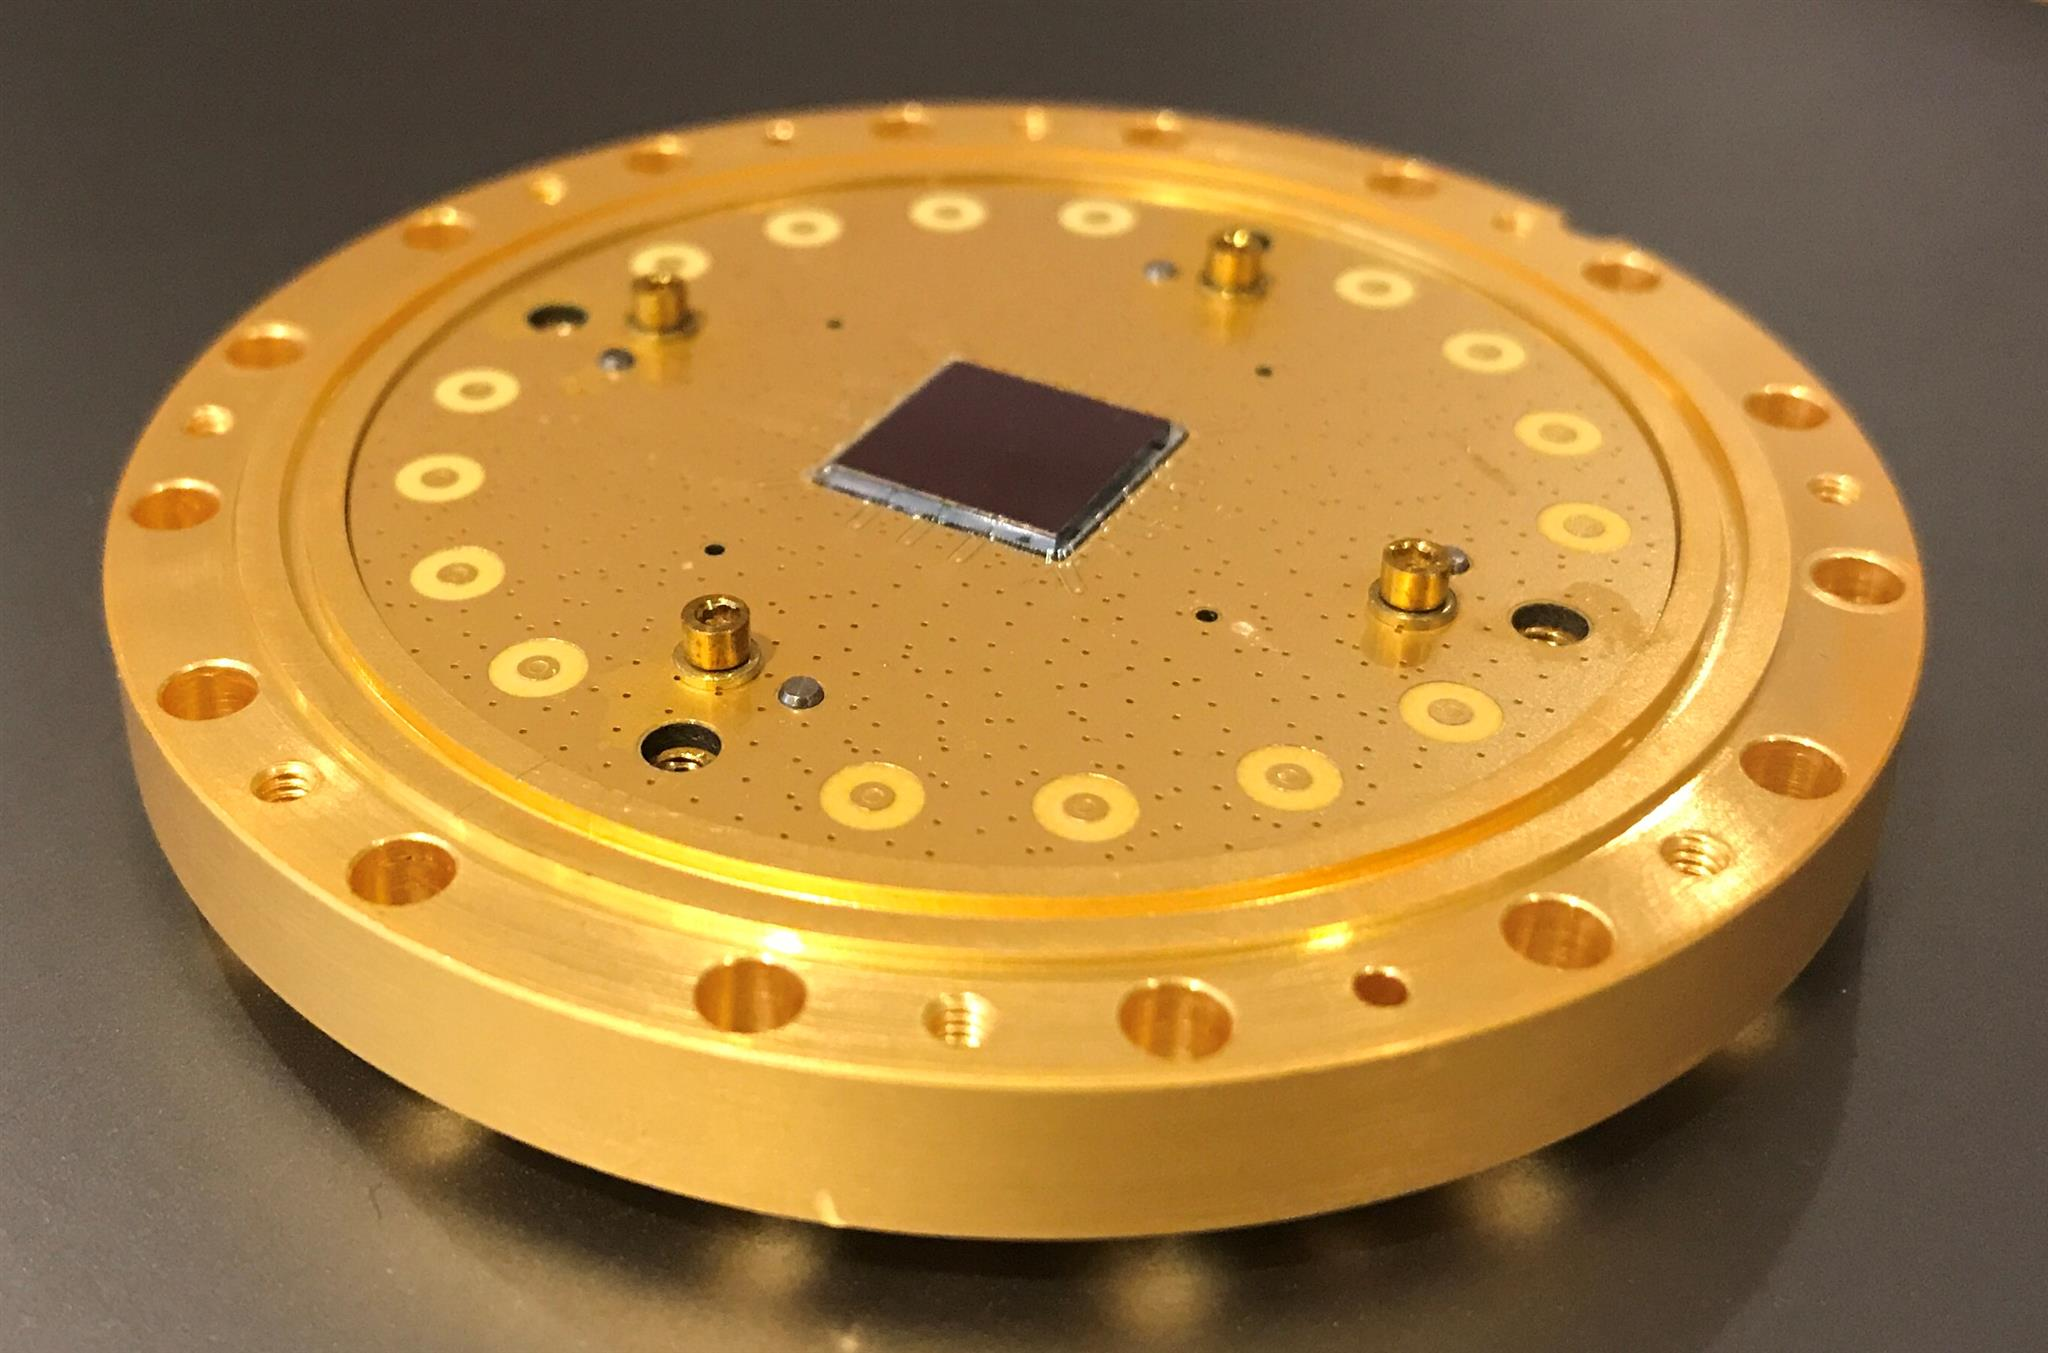 An 8-qubit quantum processor made by California-based quantum computing startup, Rigetti. Photo: Jacob Biamonte // Skoltech.